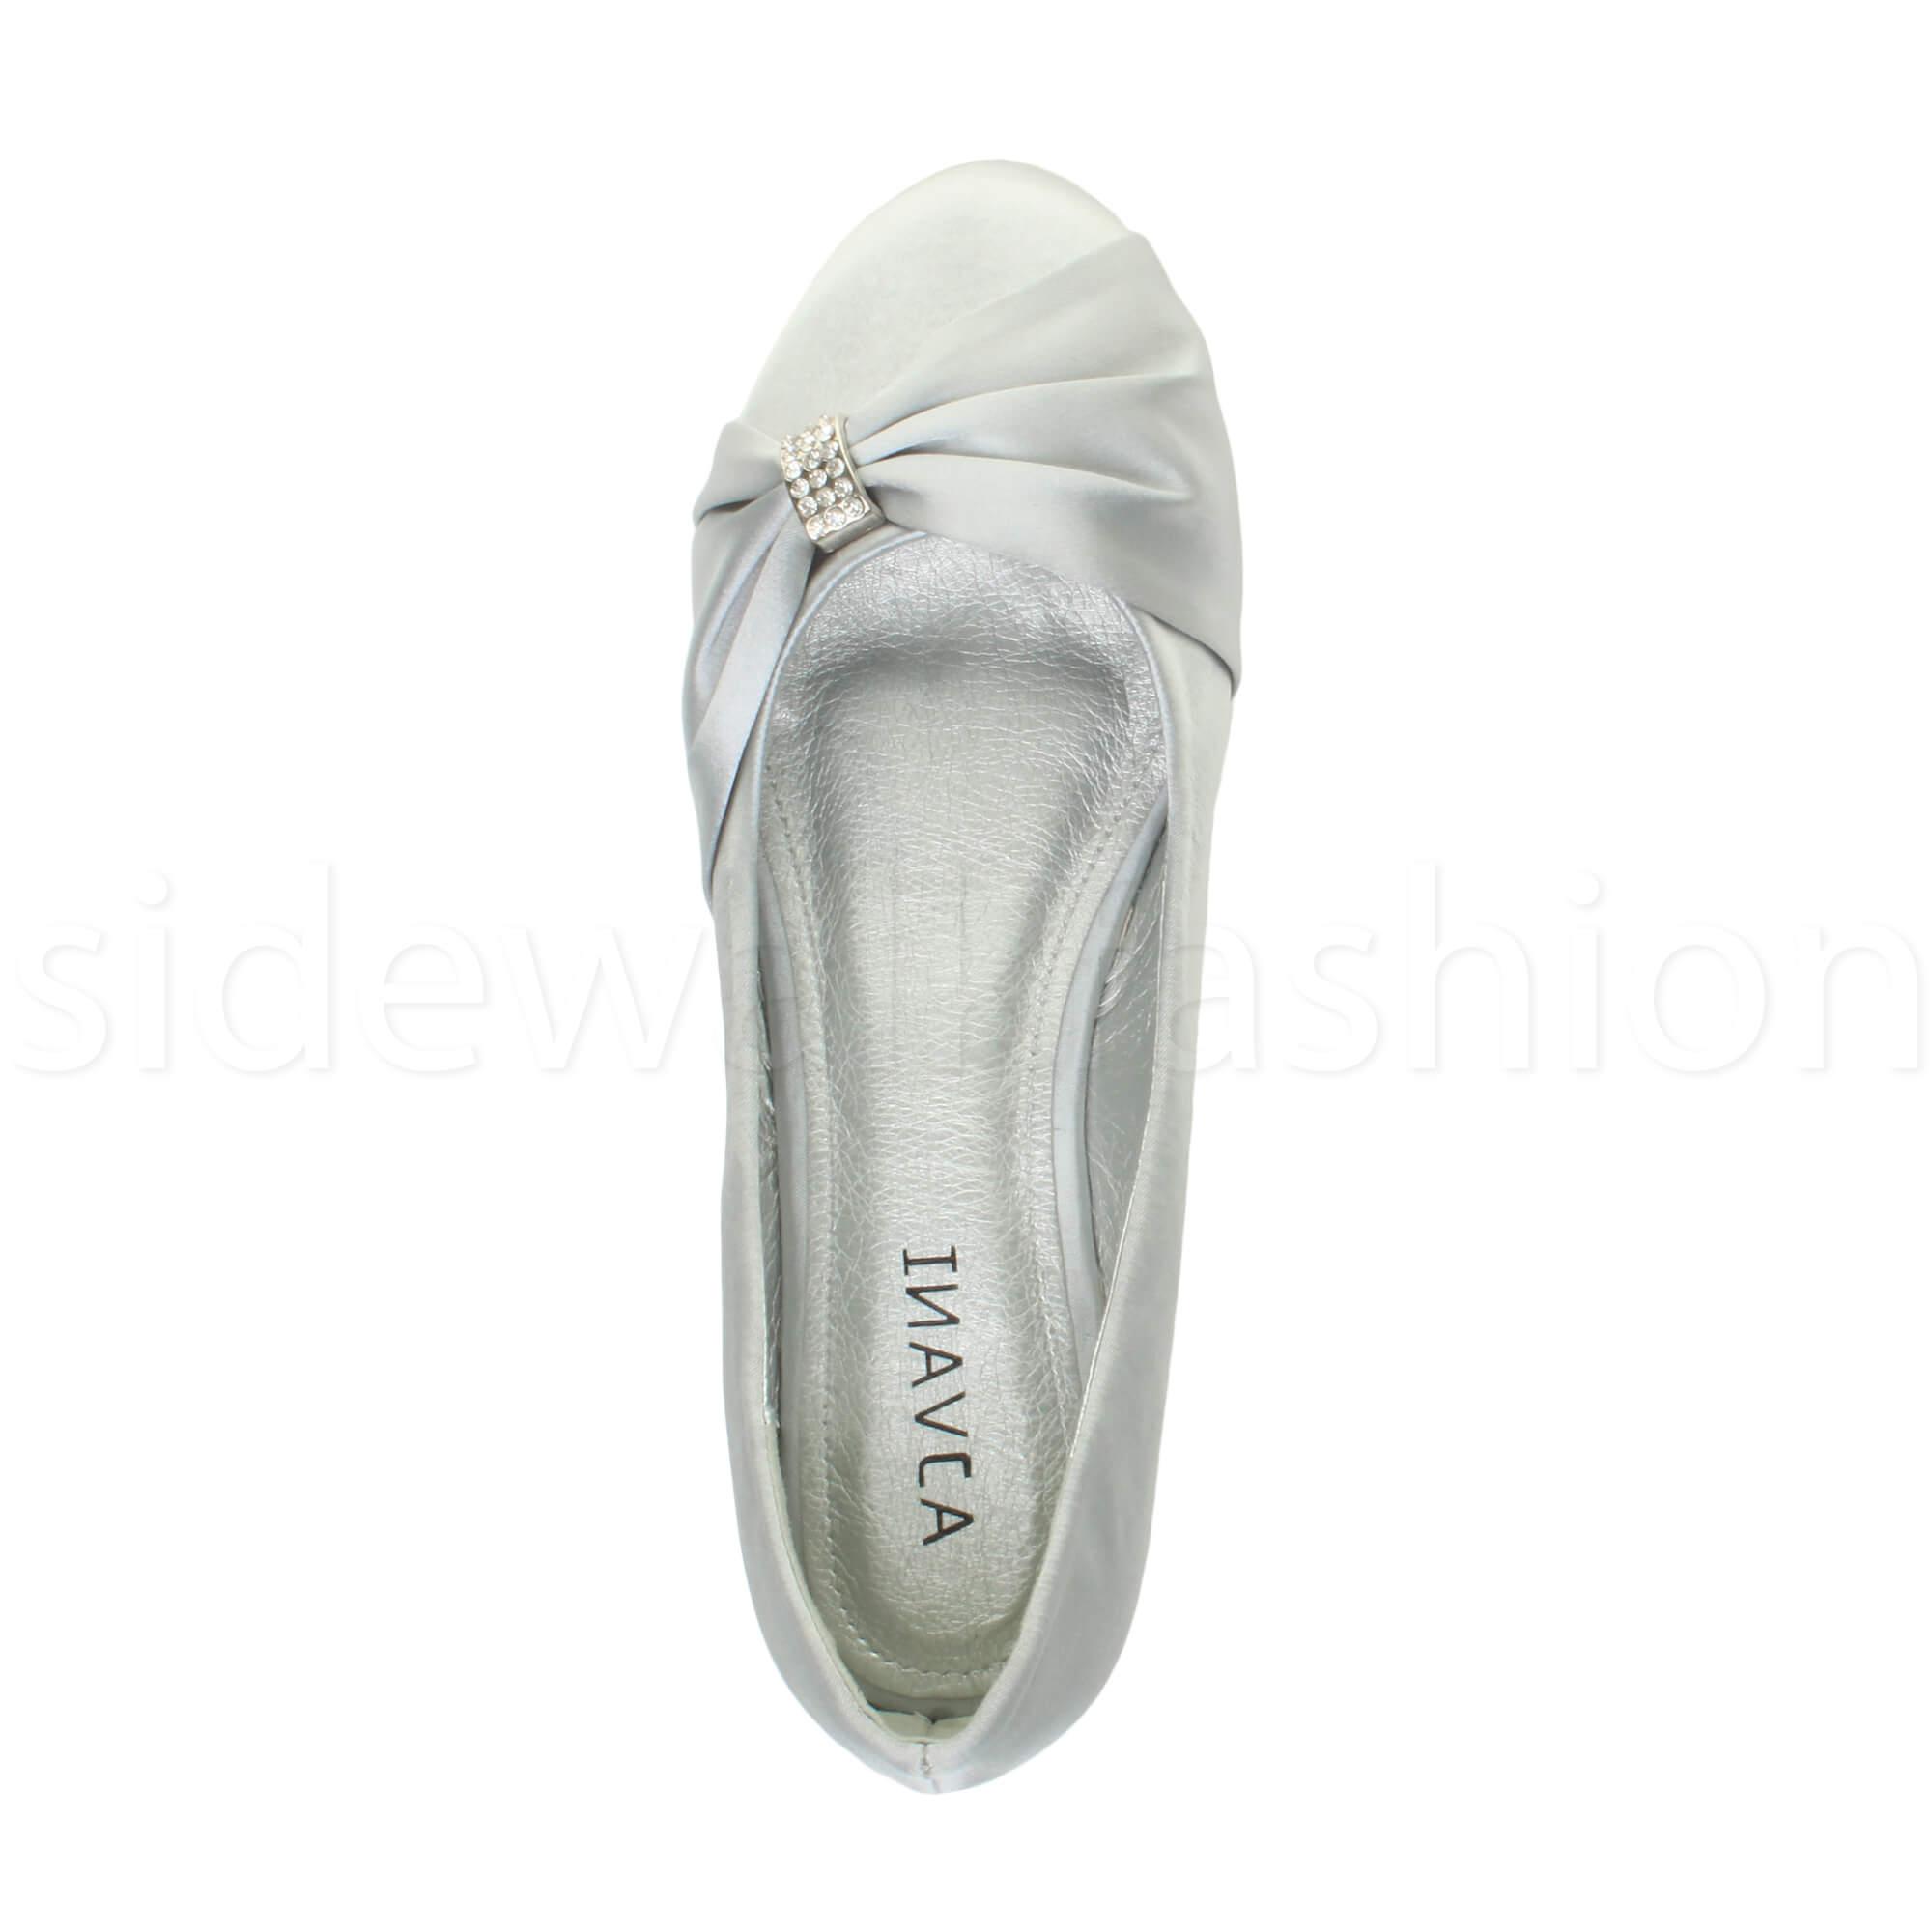 Womens-ladies-flat-wedding-bridesmaid-ruched-diamante-bridal-shoes-pumps-size thumbnail 32